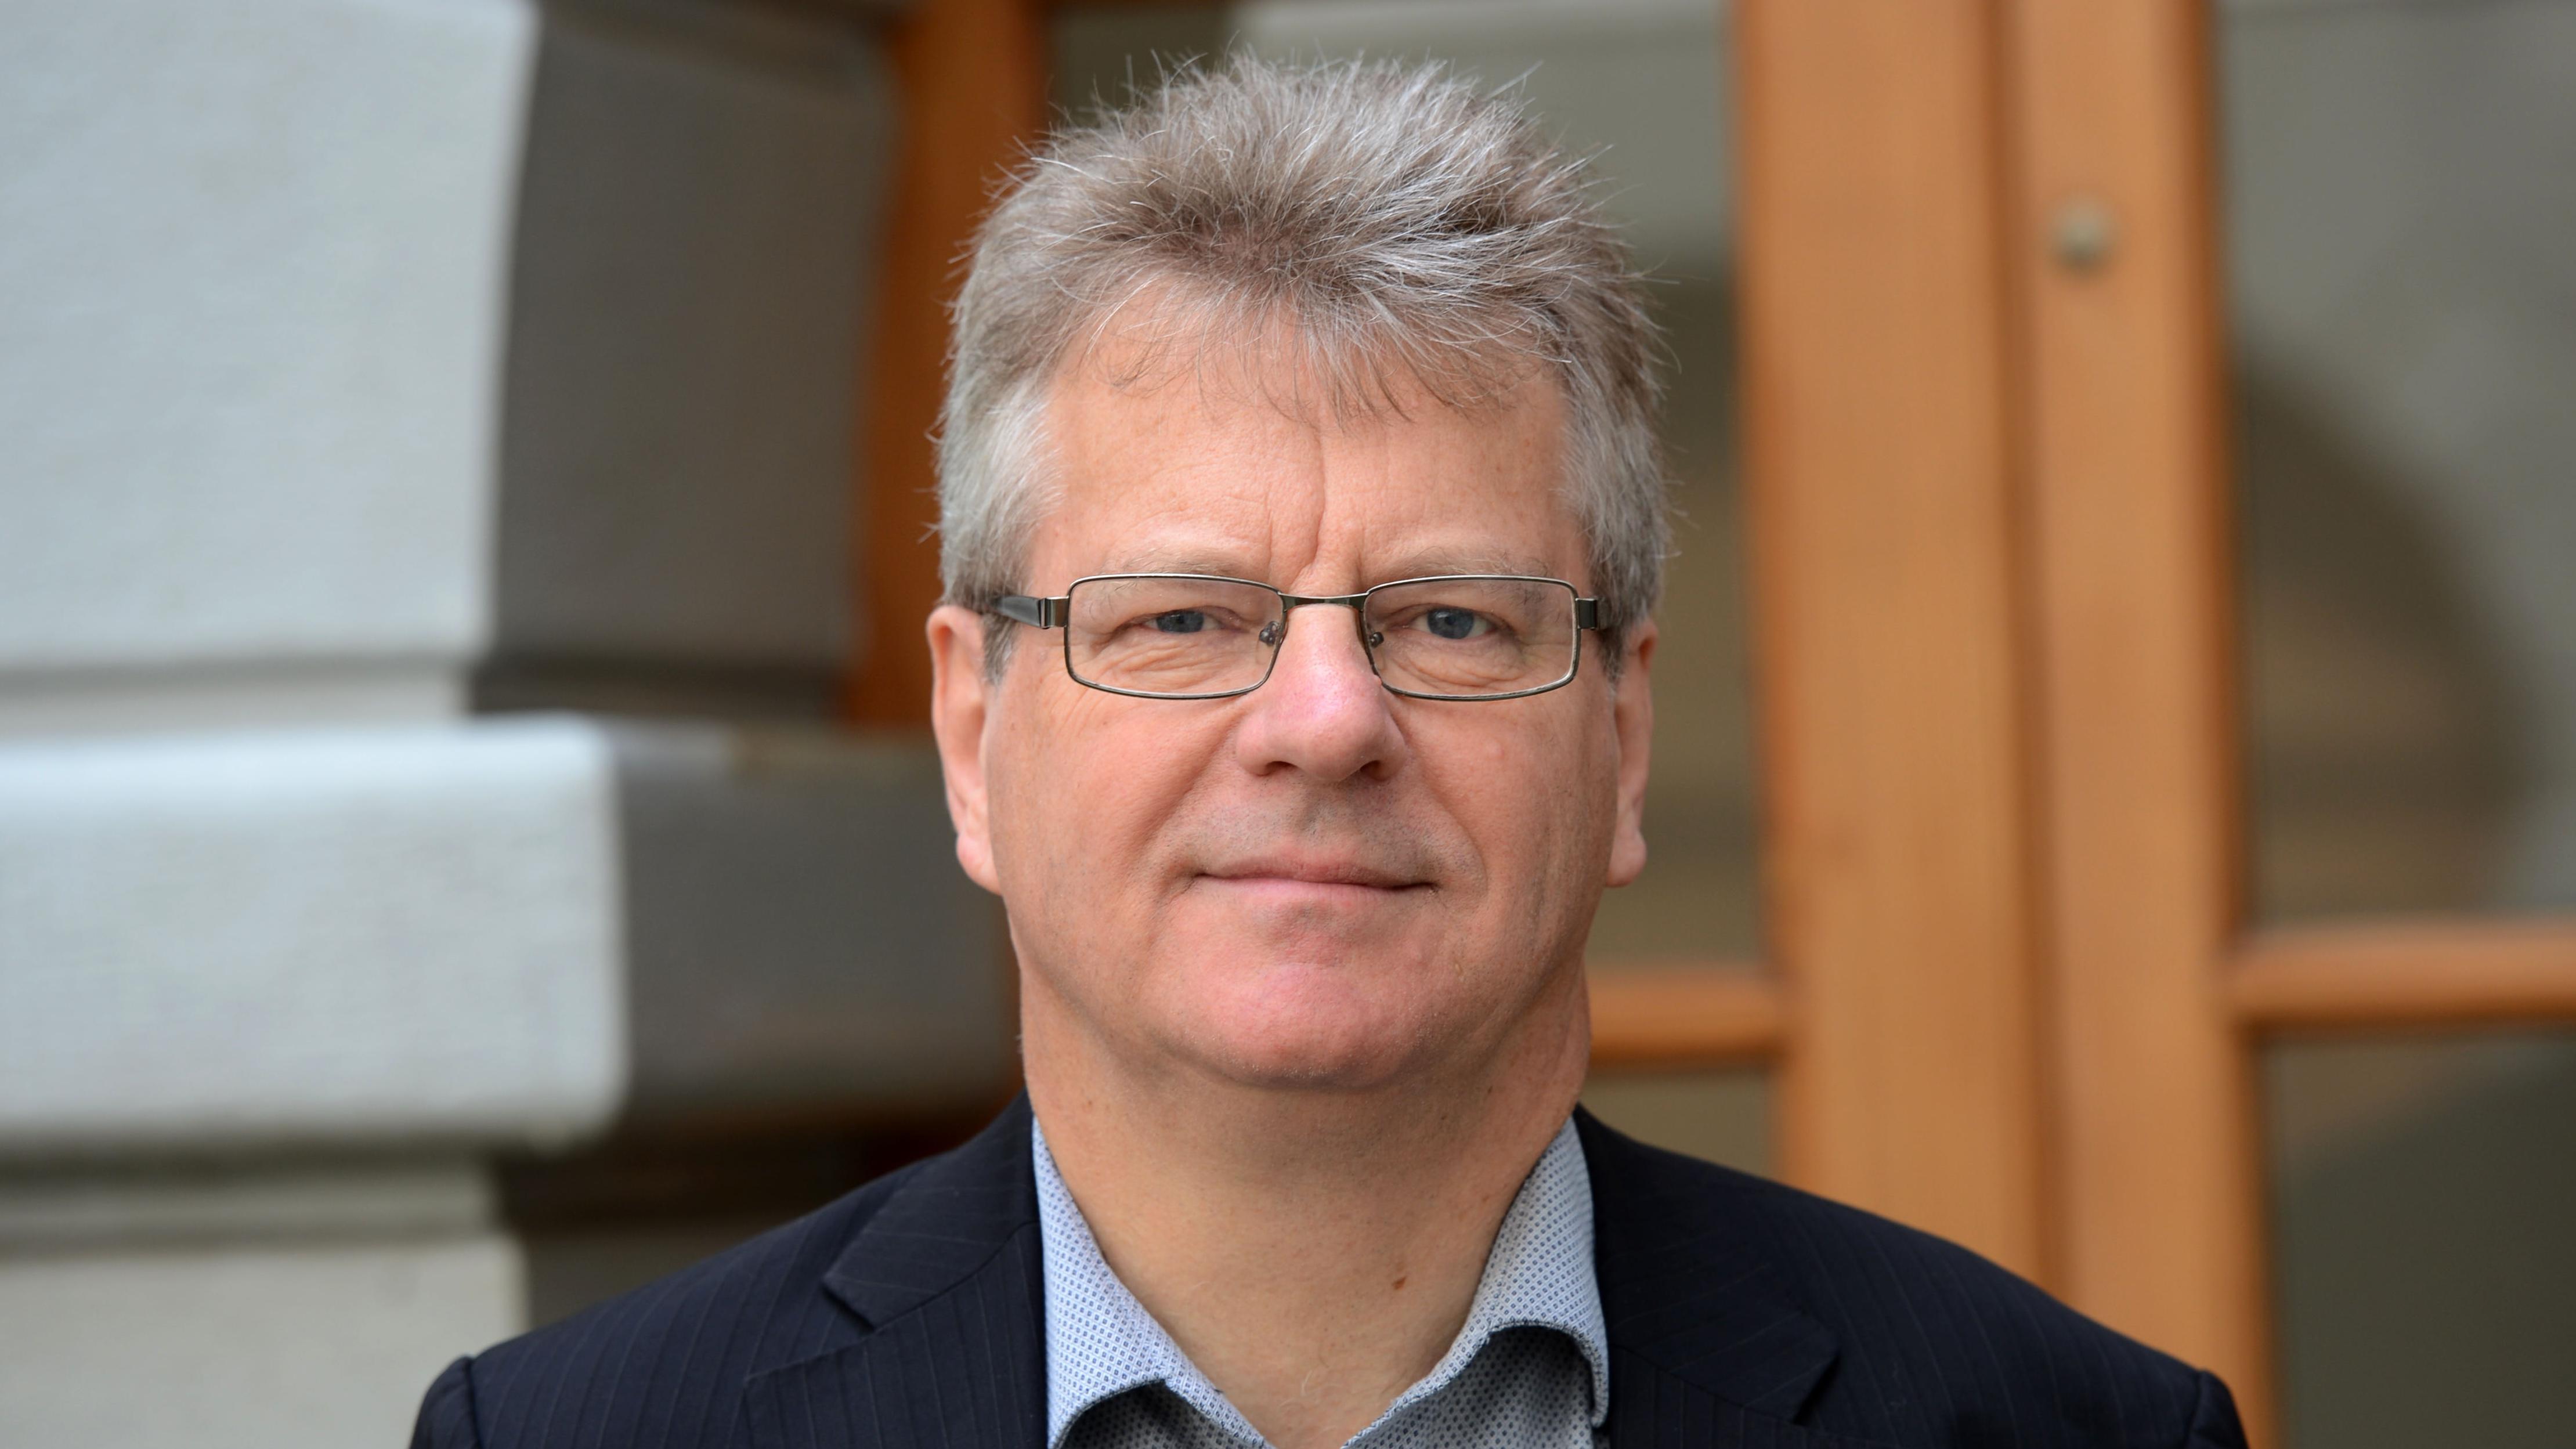 Prof. Bernhardt